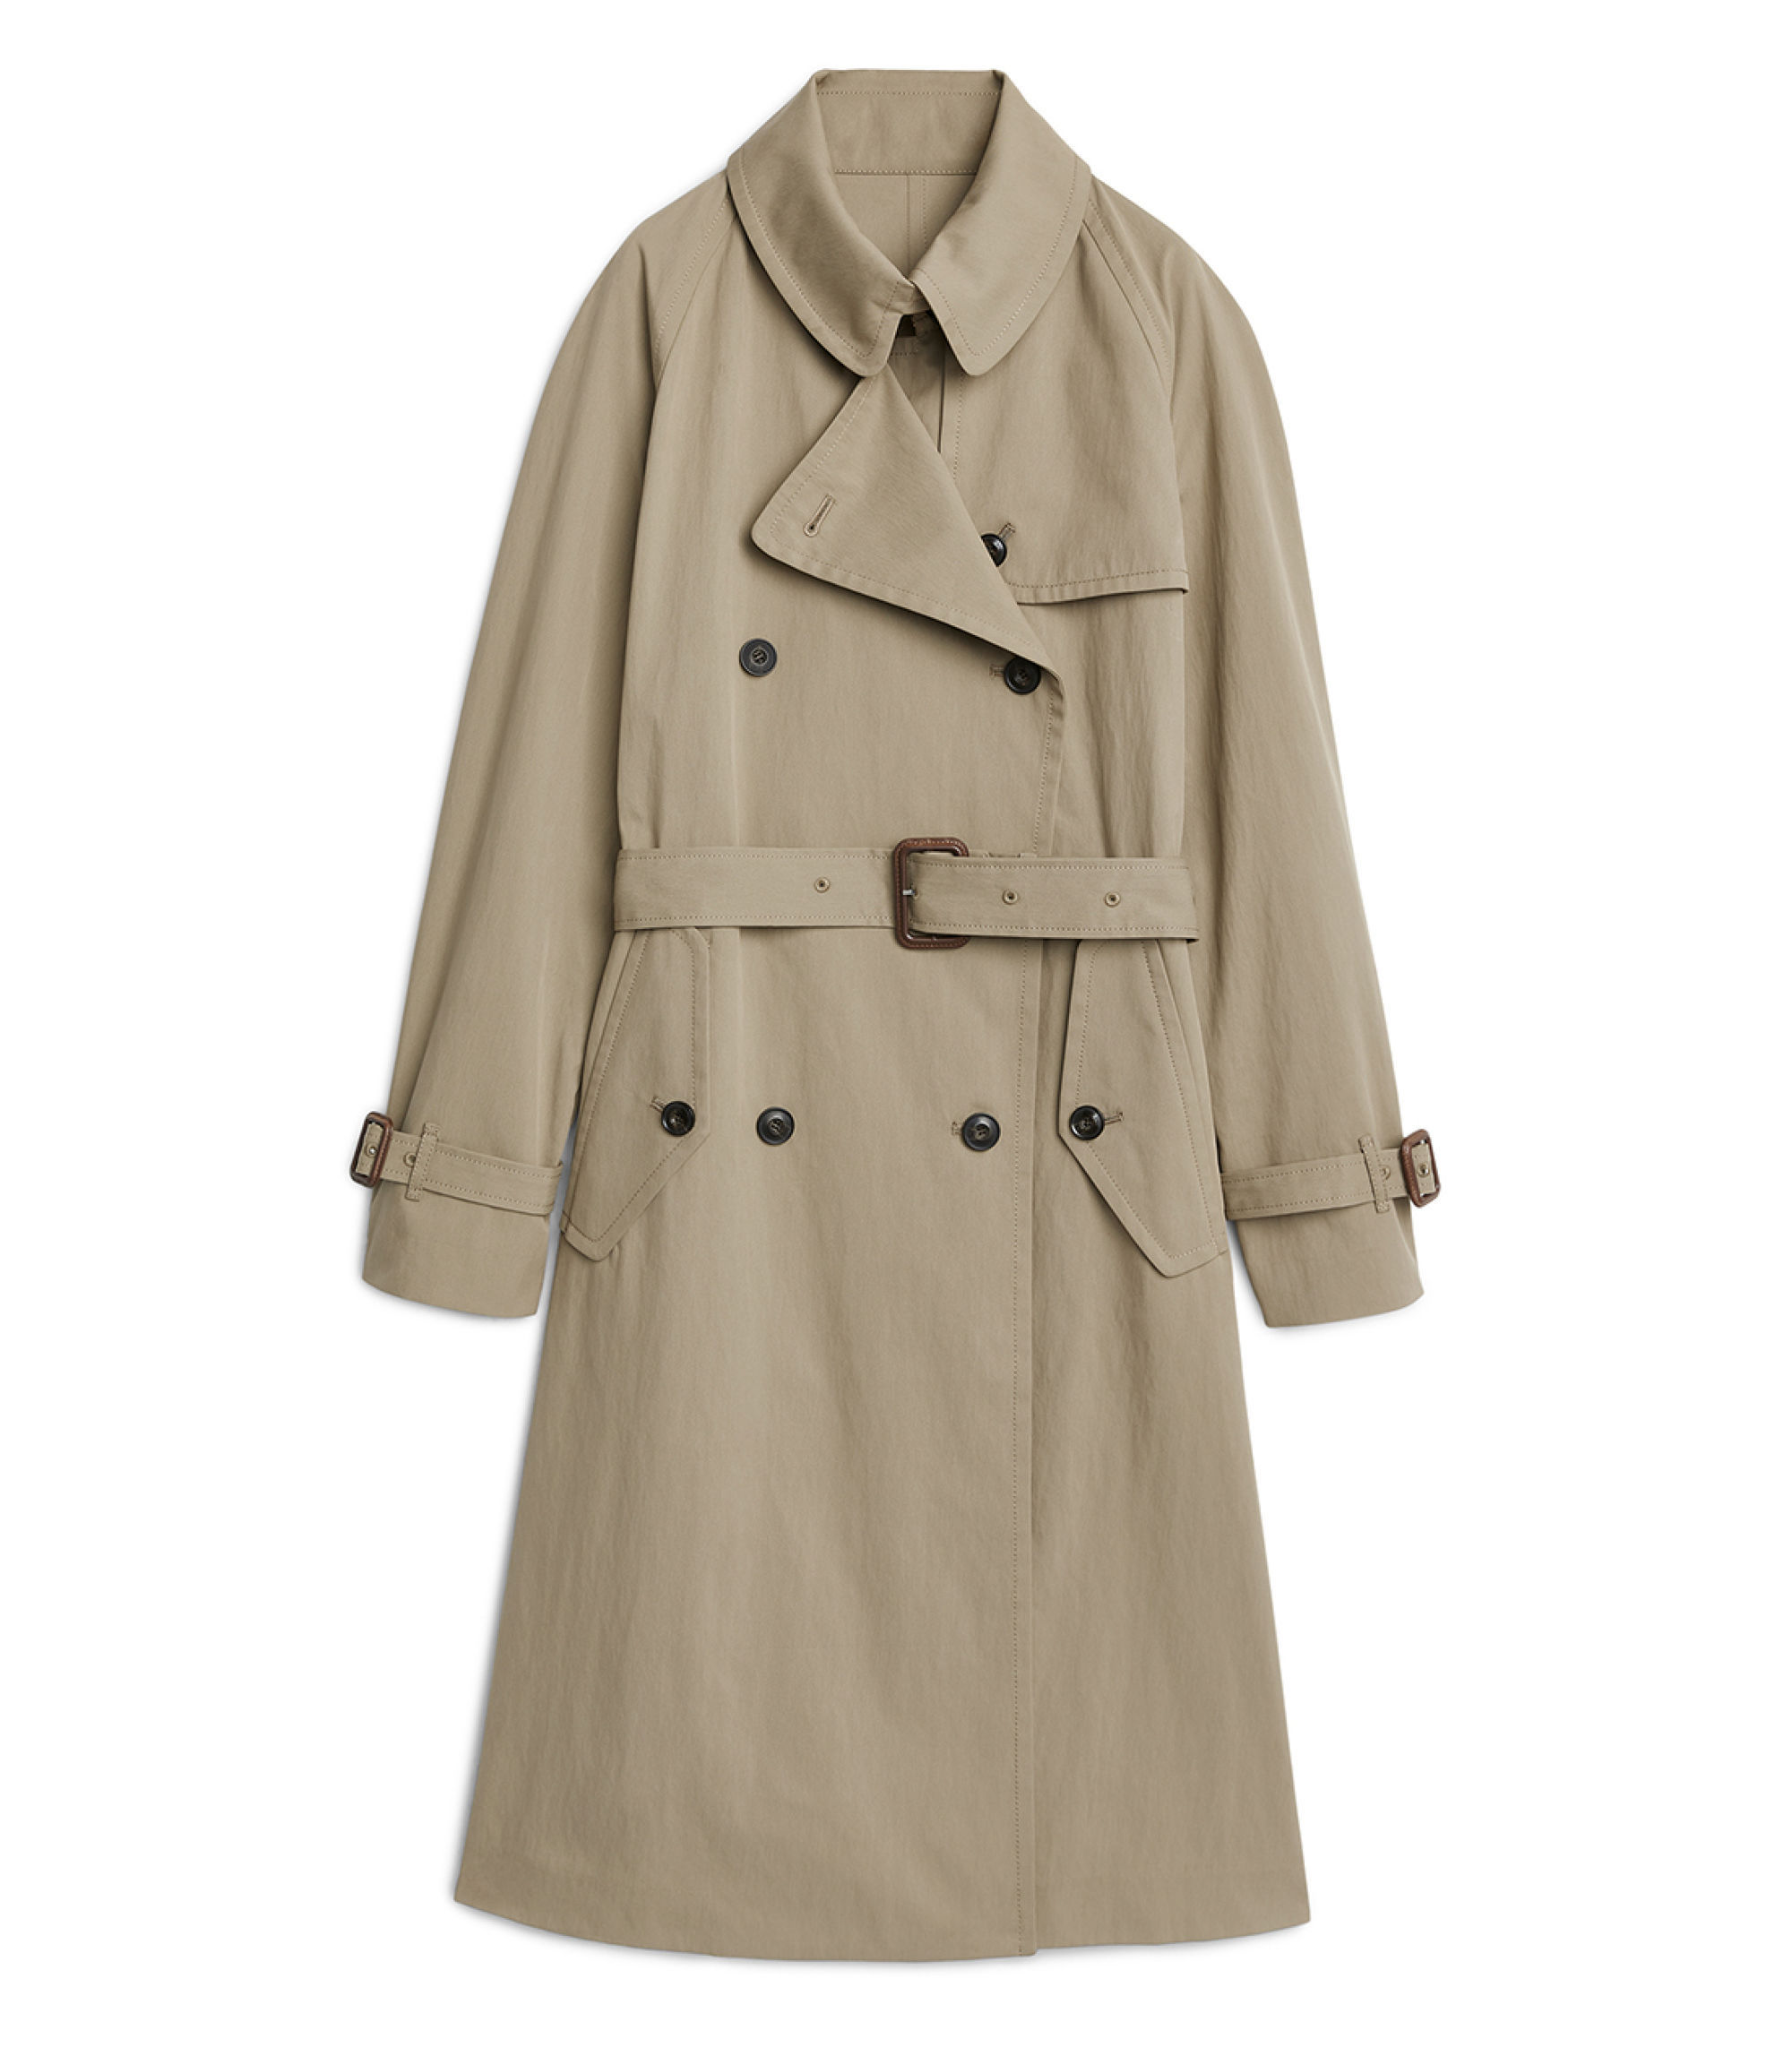 Twill Trench Coat  £225